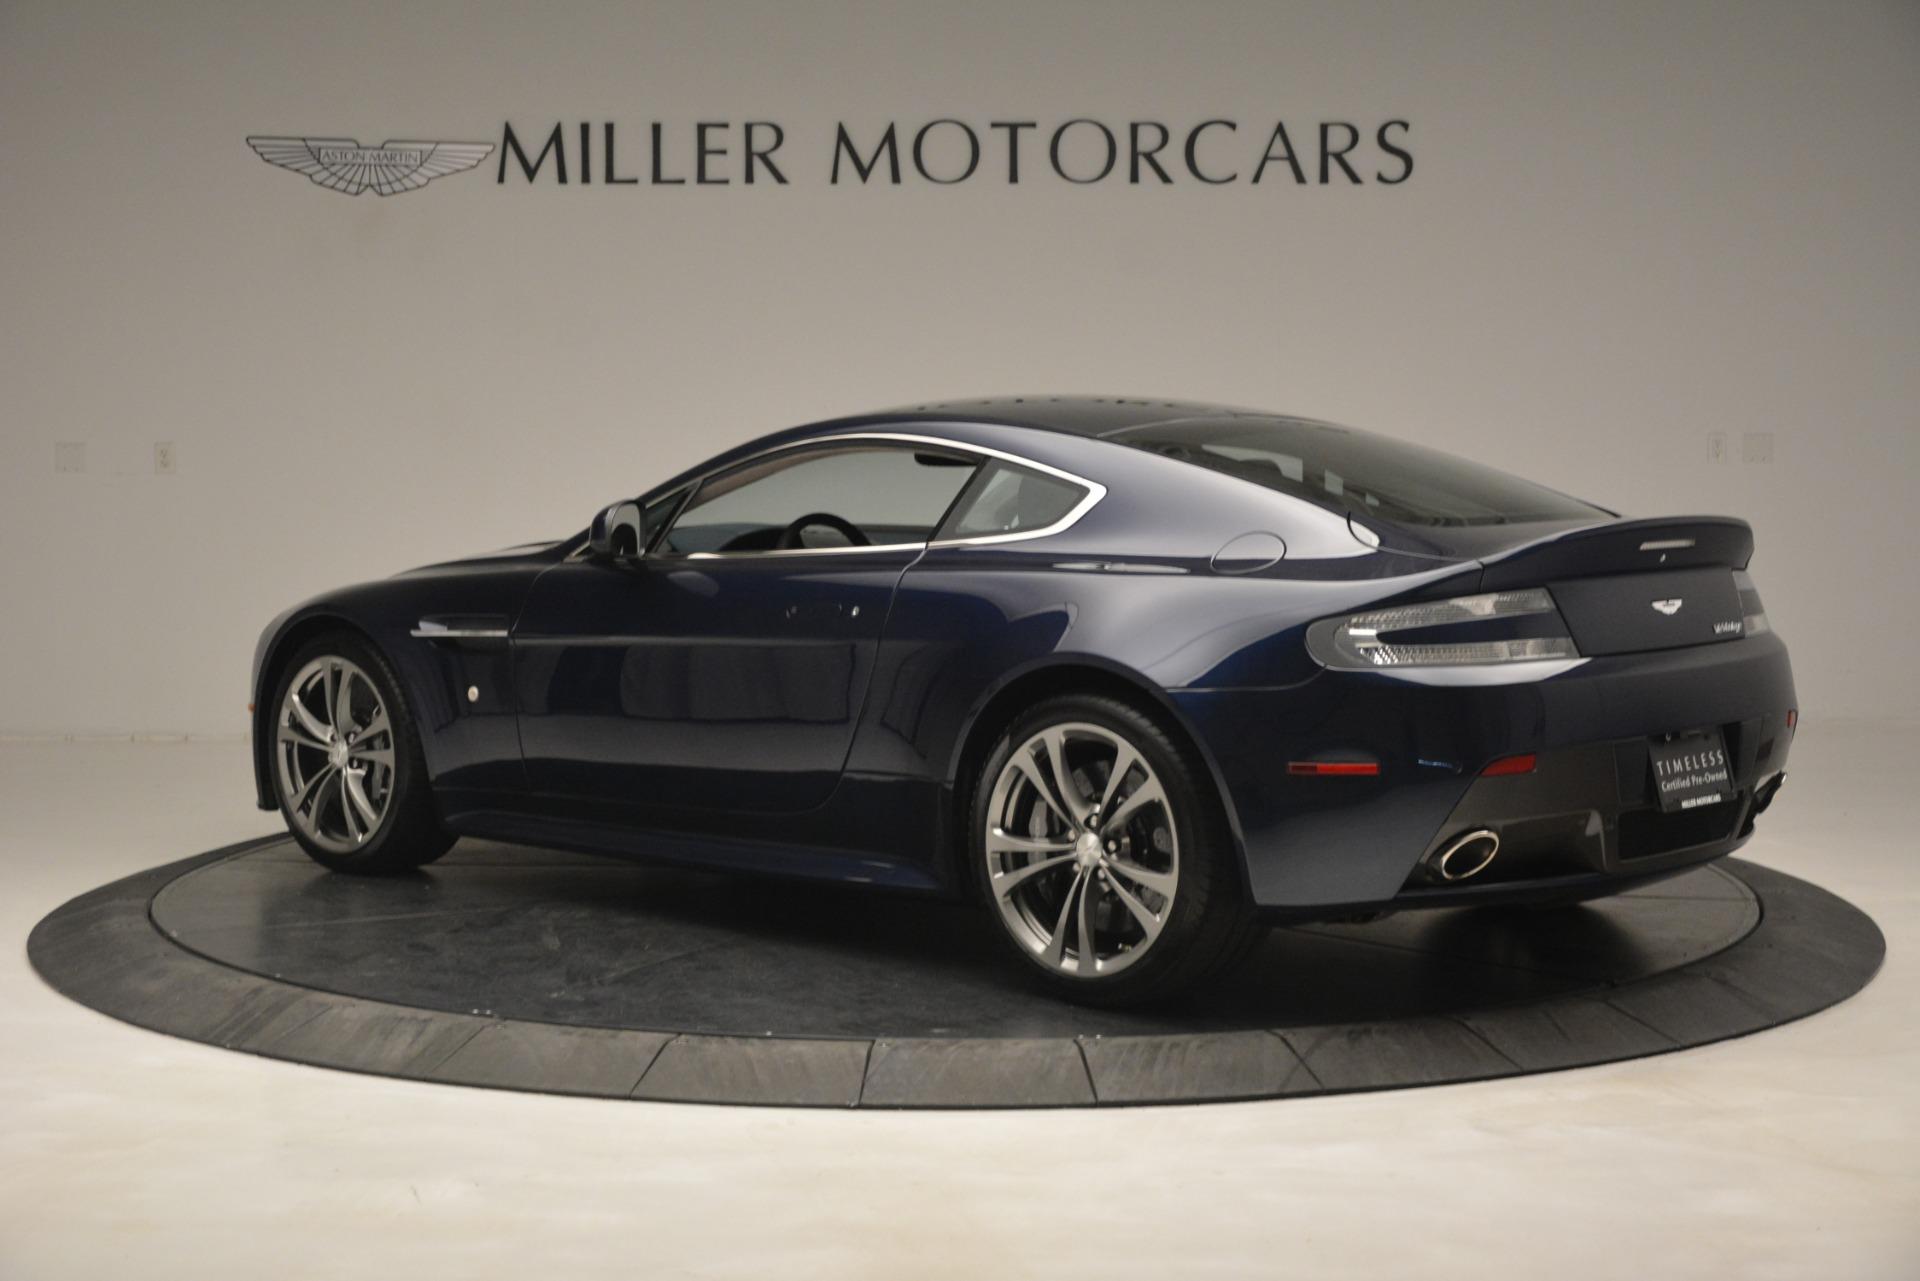 Used 2012 Aston Martin V12 Vantage  For Sale In Greenwich, CT. Alfa Romeo of Greenwich, 7524 3046_p4